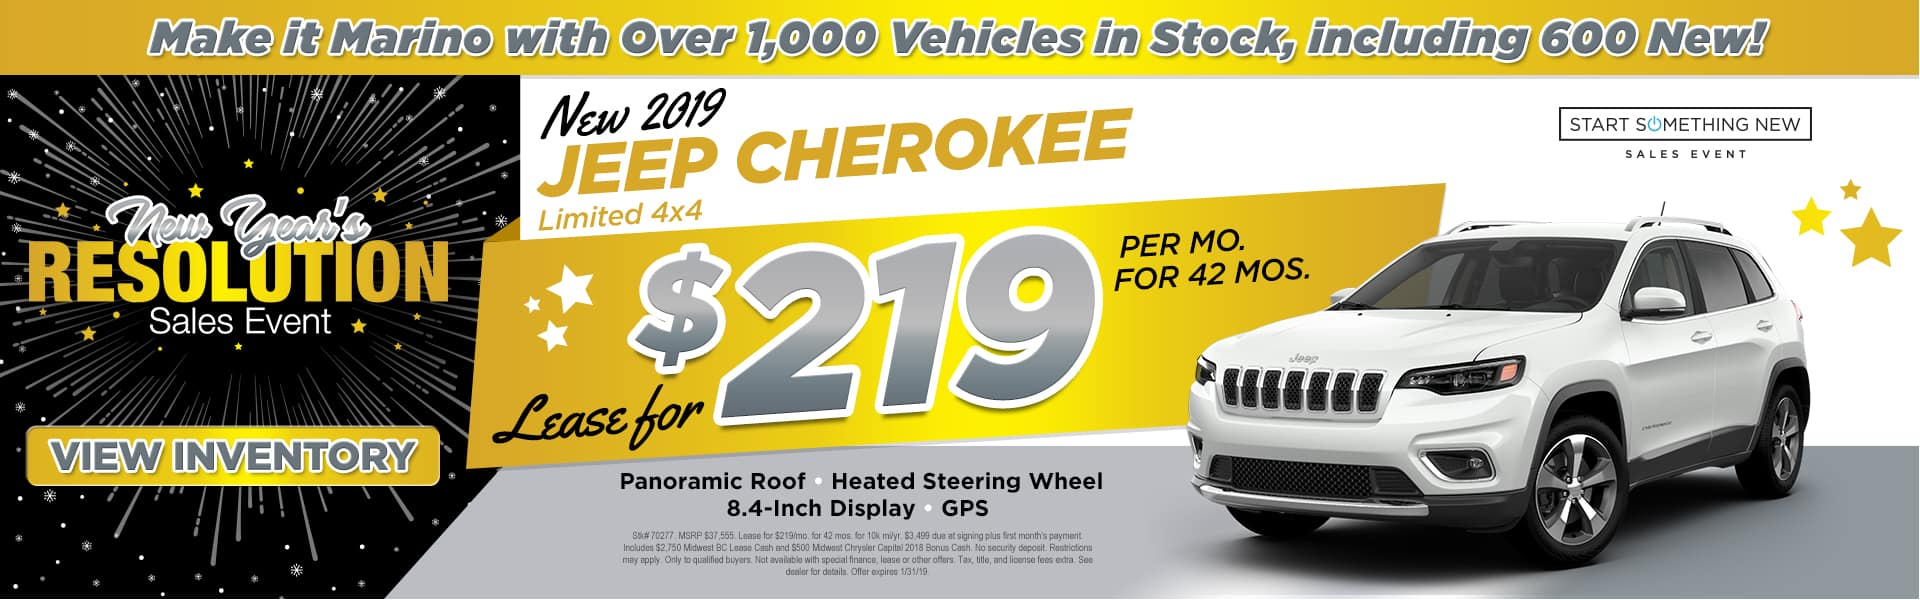 Chrysler Jeep Dodge Ram Dealer Chicago Il Marino Cjdr Car Parts Diagram Cherokee Xj Instrument Panel Components